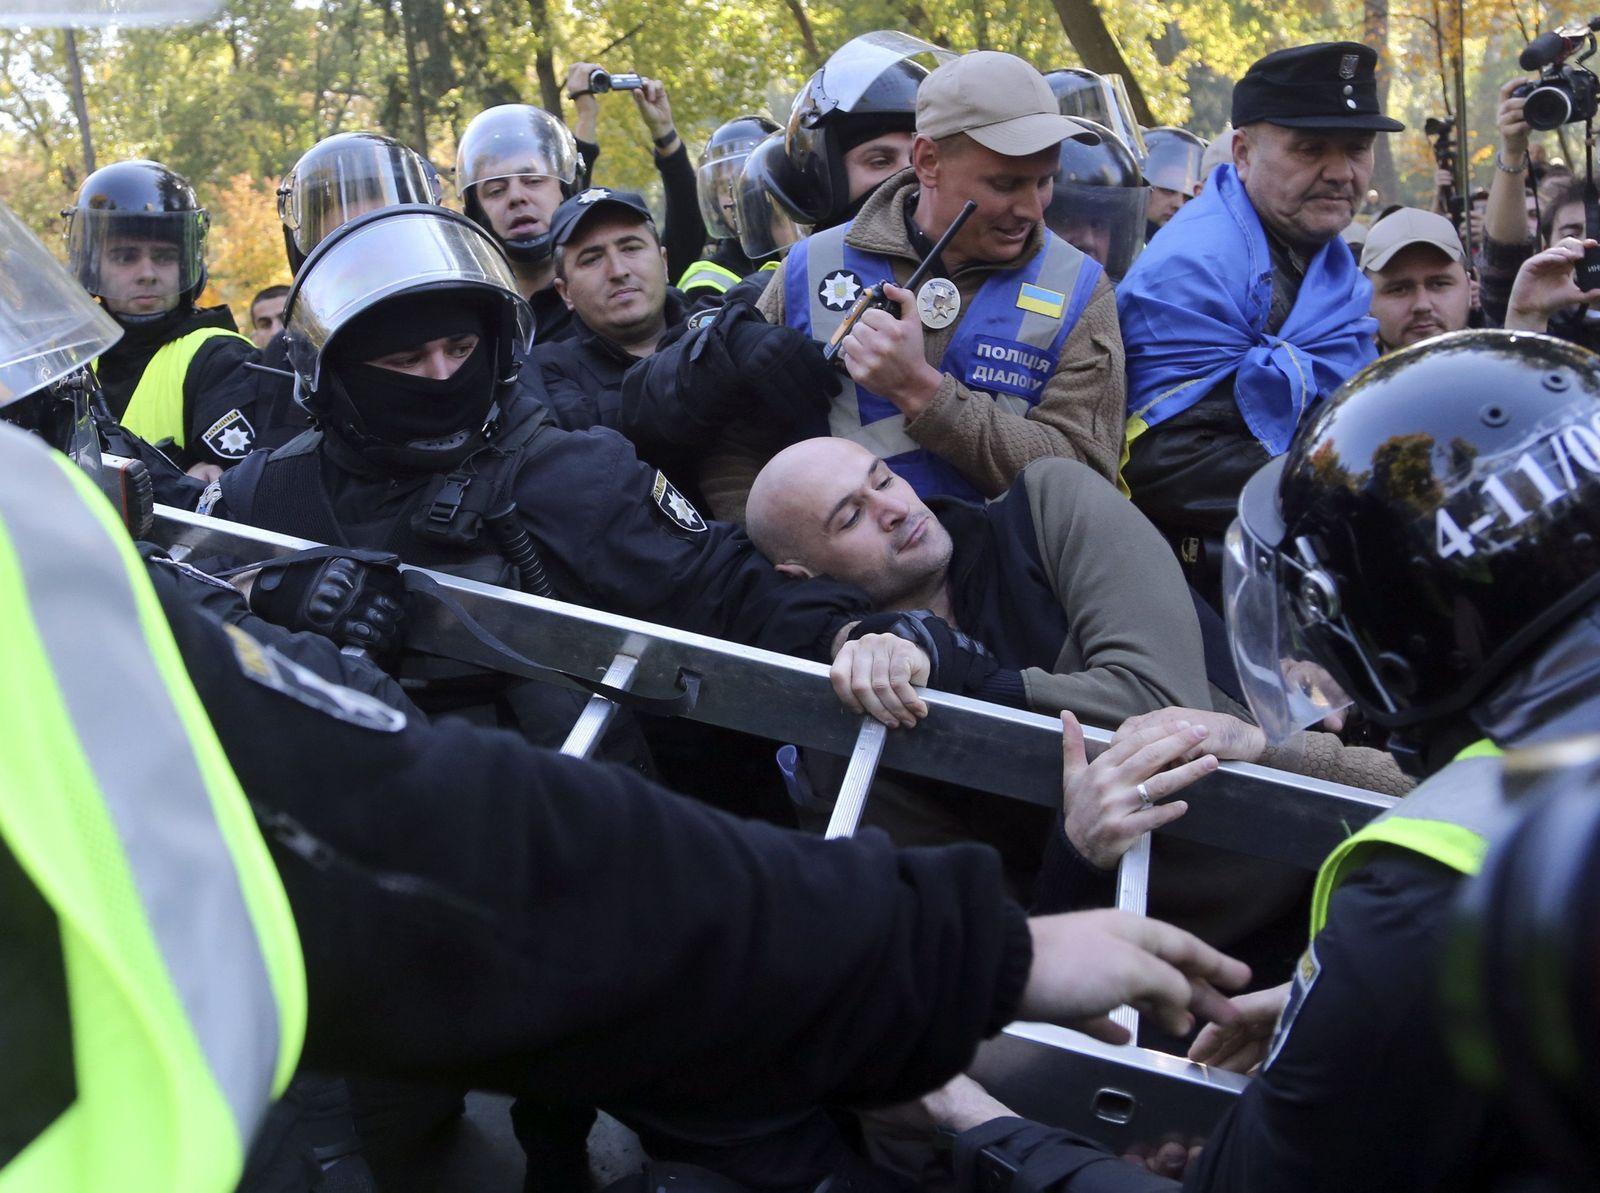 Rechte protestieren in der Ukraine